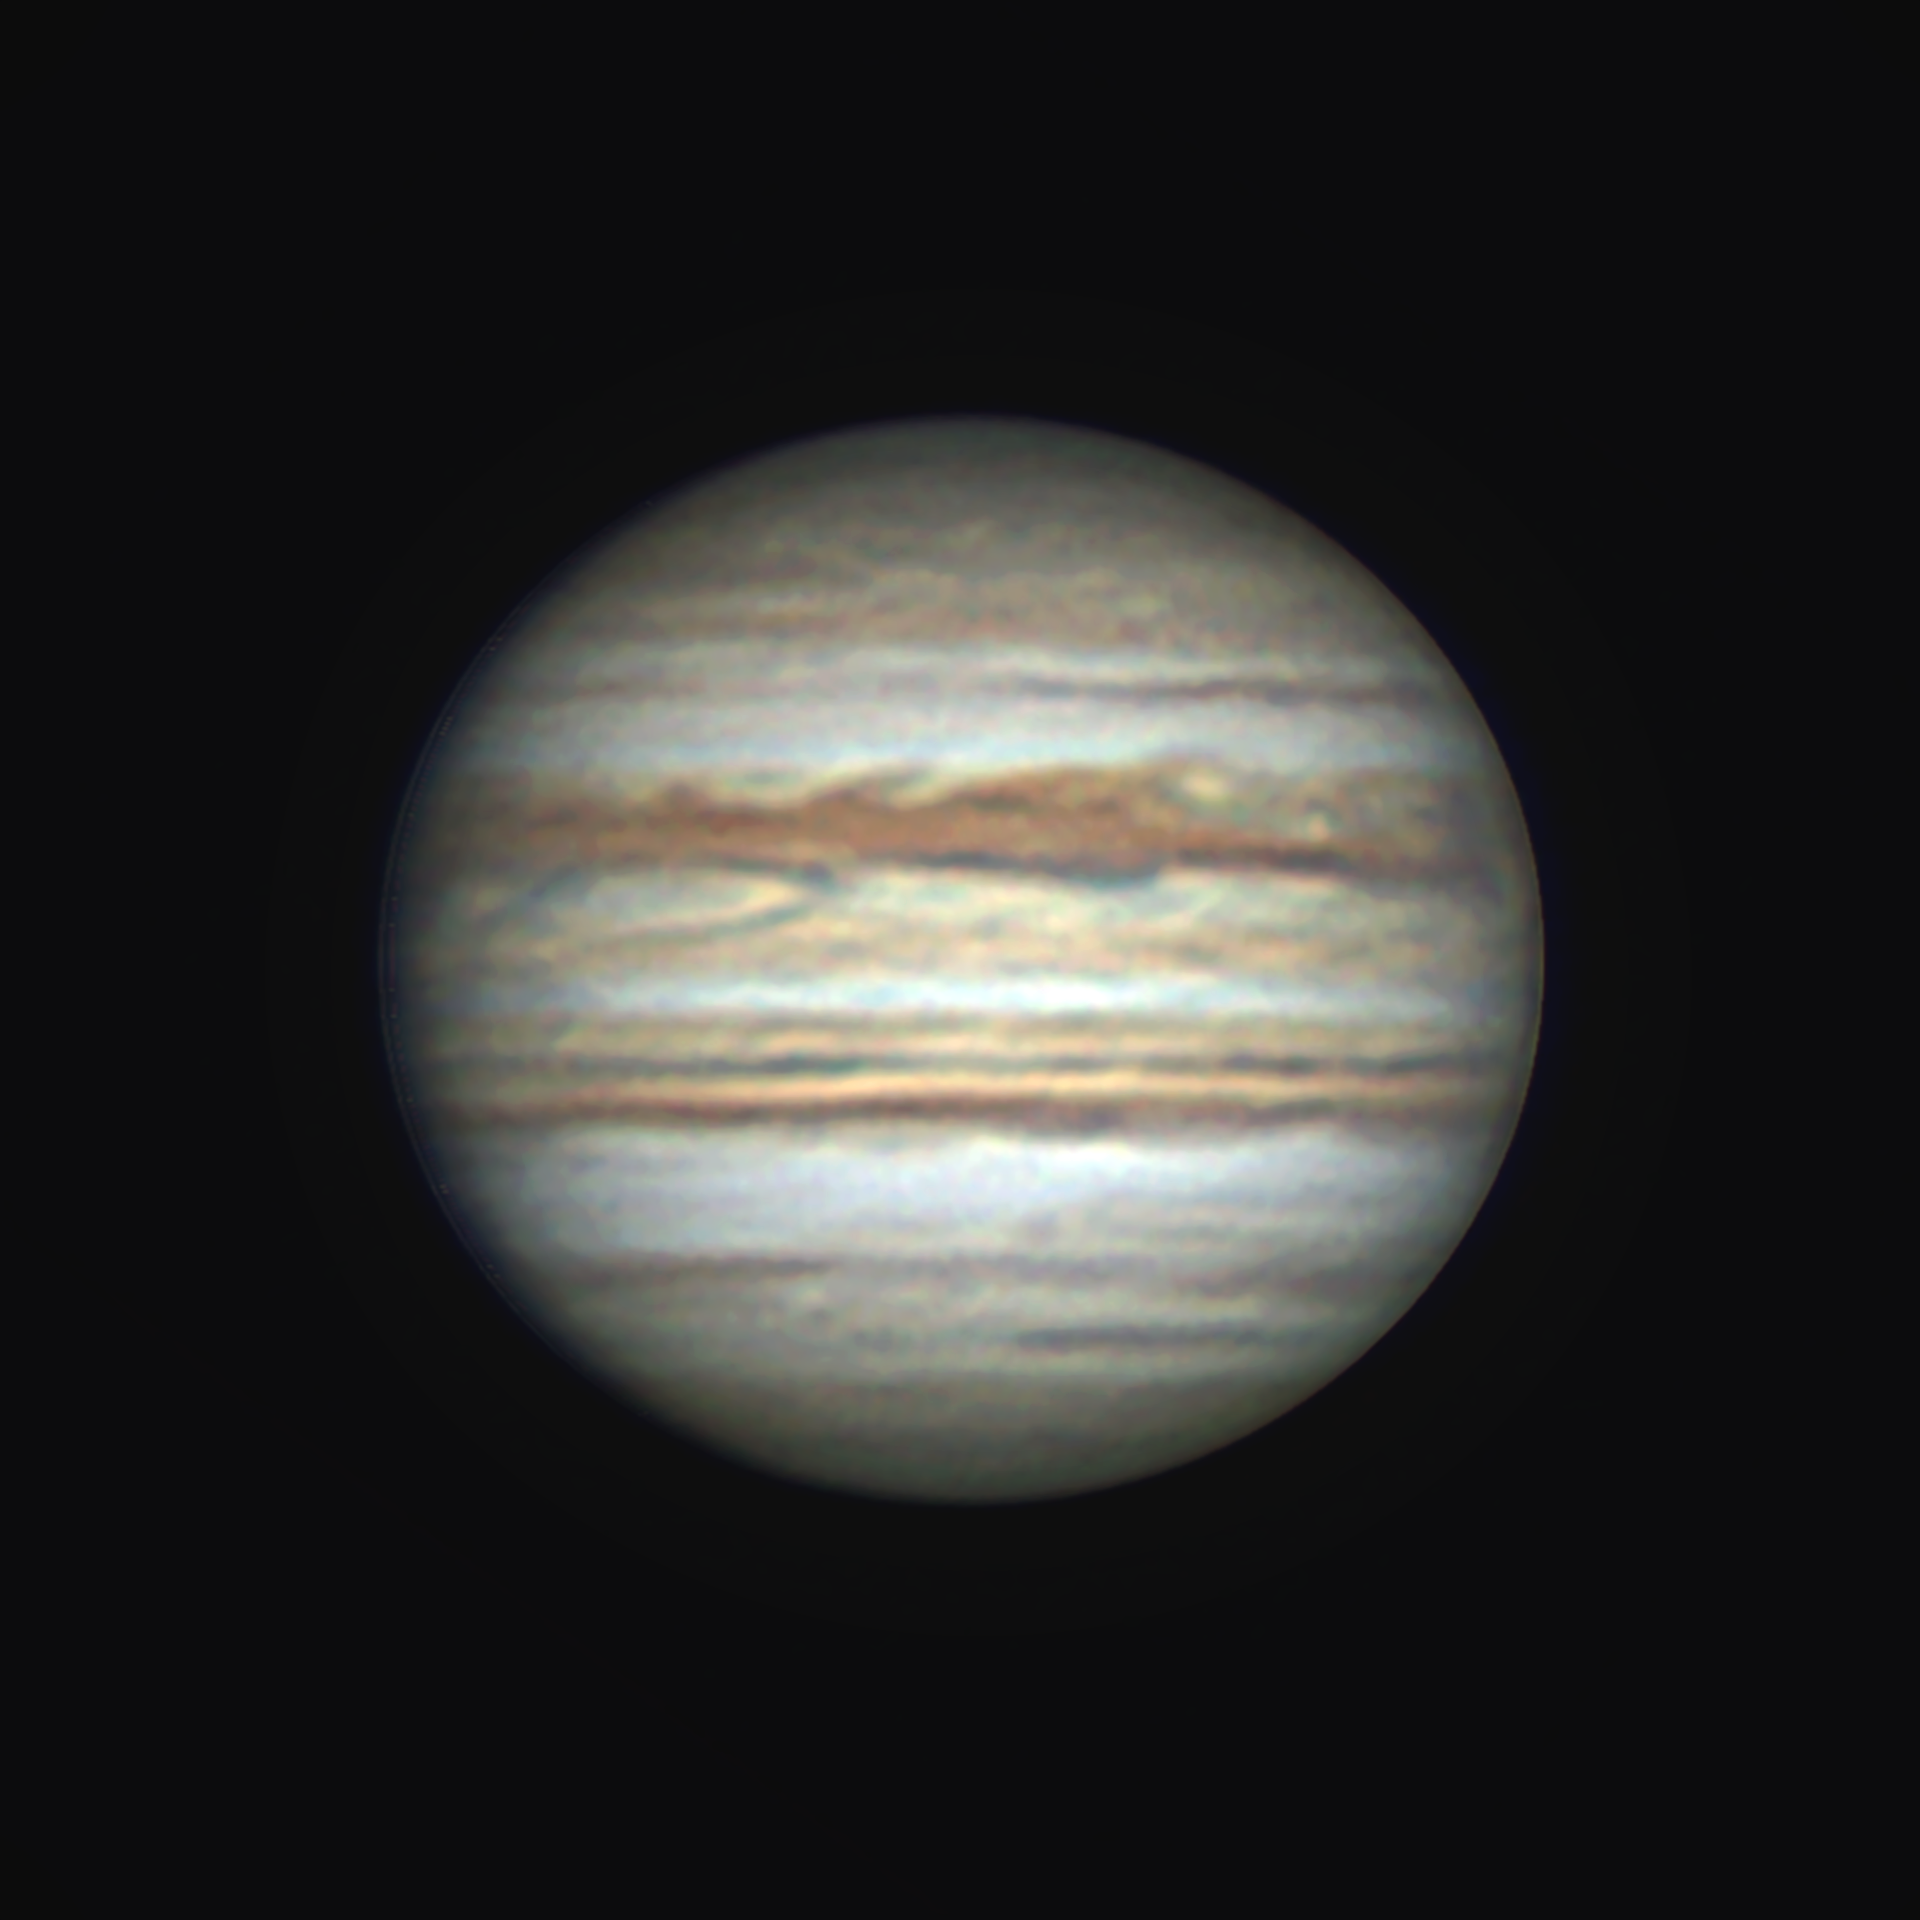 2020-07-29-2140_7-derot2comb-RGB.png.840a552ccce2415c6cef1fff871baeac.png